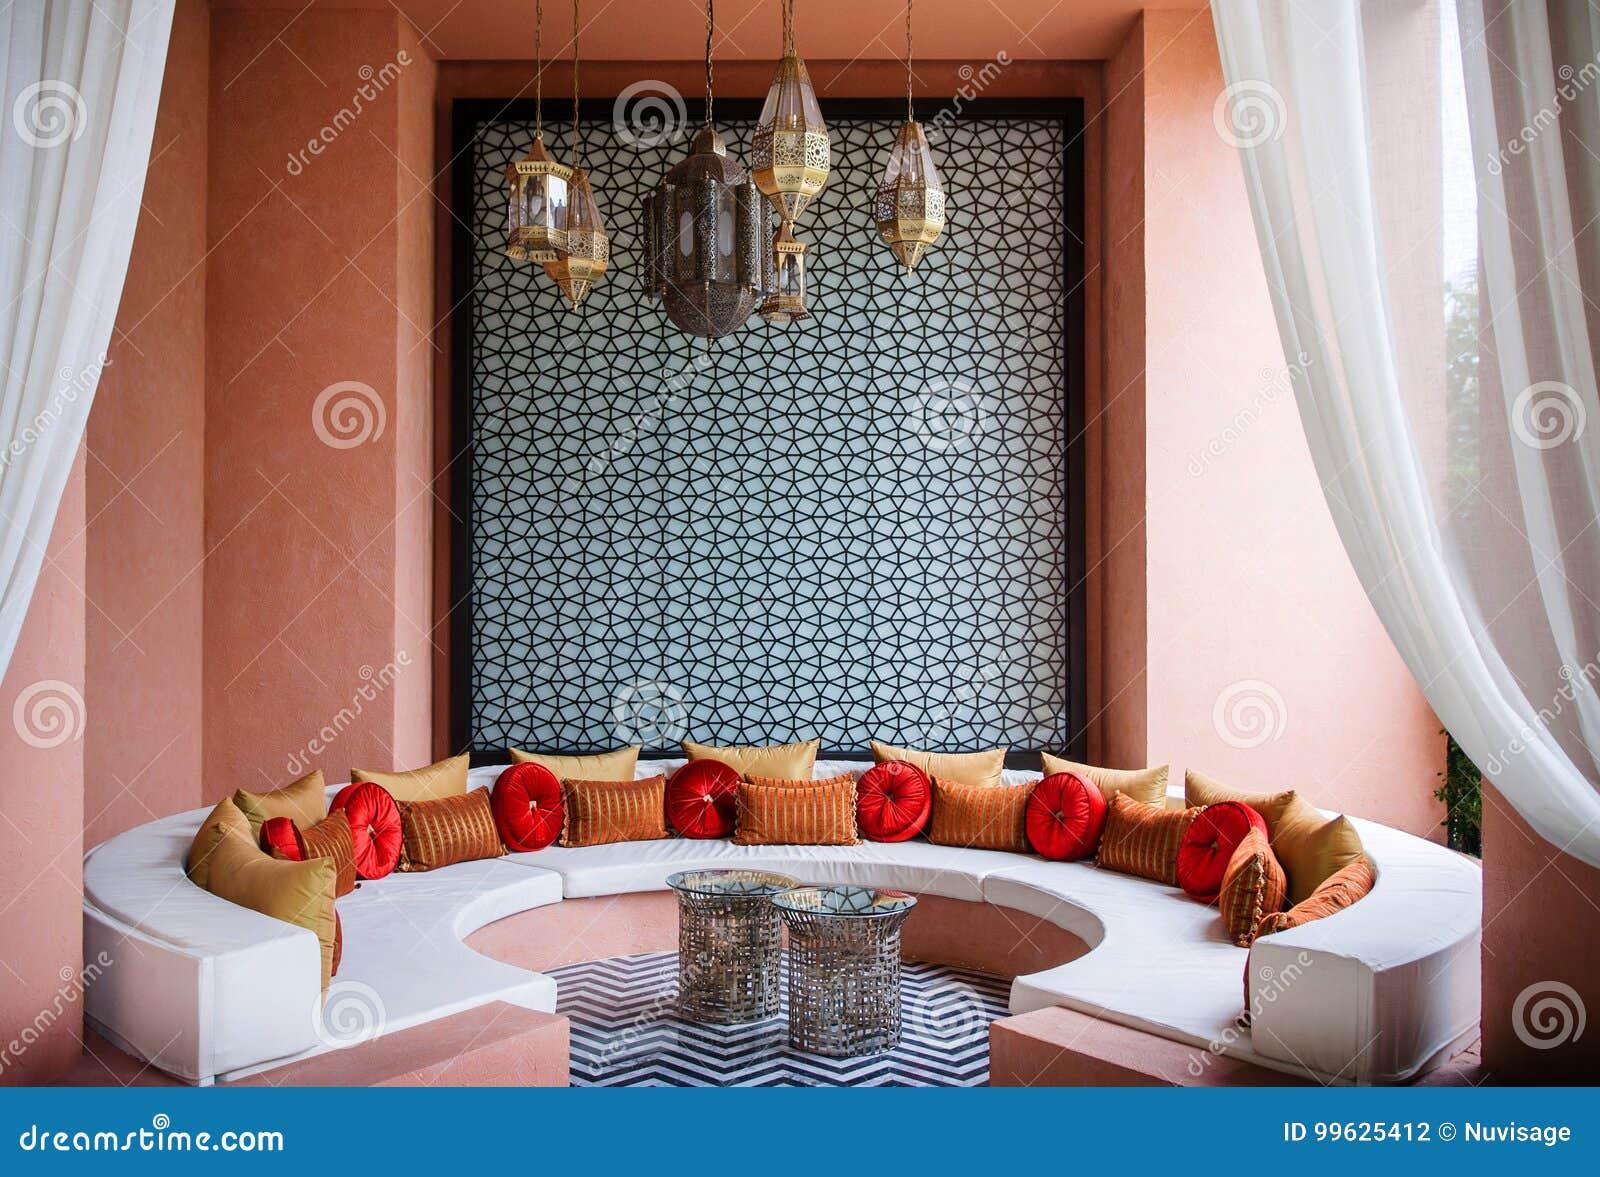 Salon Marocain Maroc Prix salon marocain de style, décoration marocaine photographie